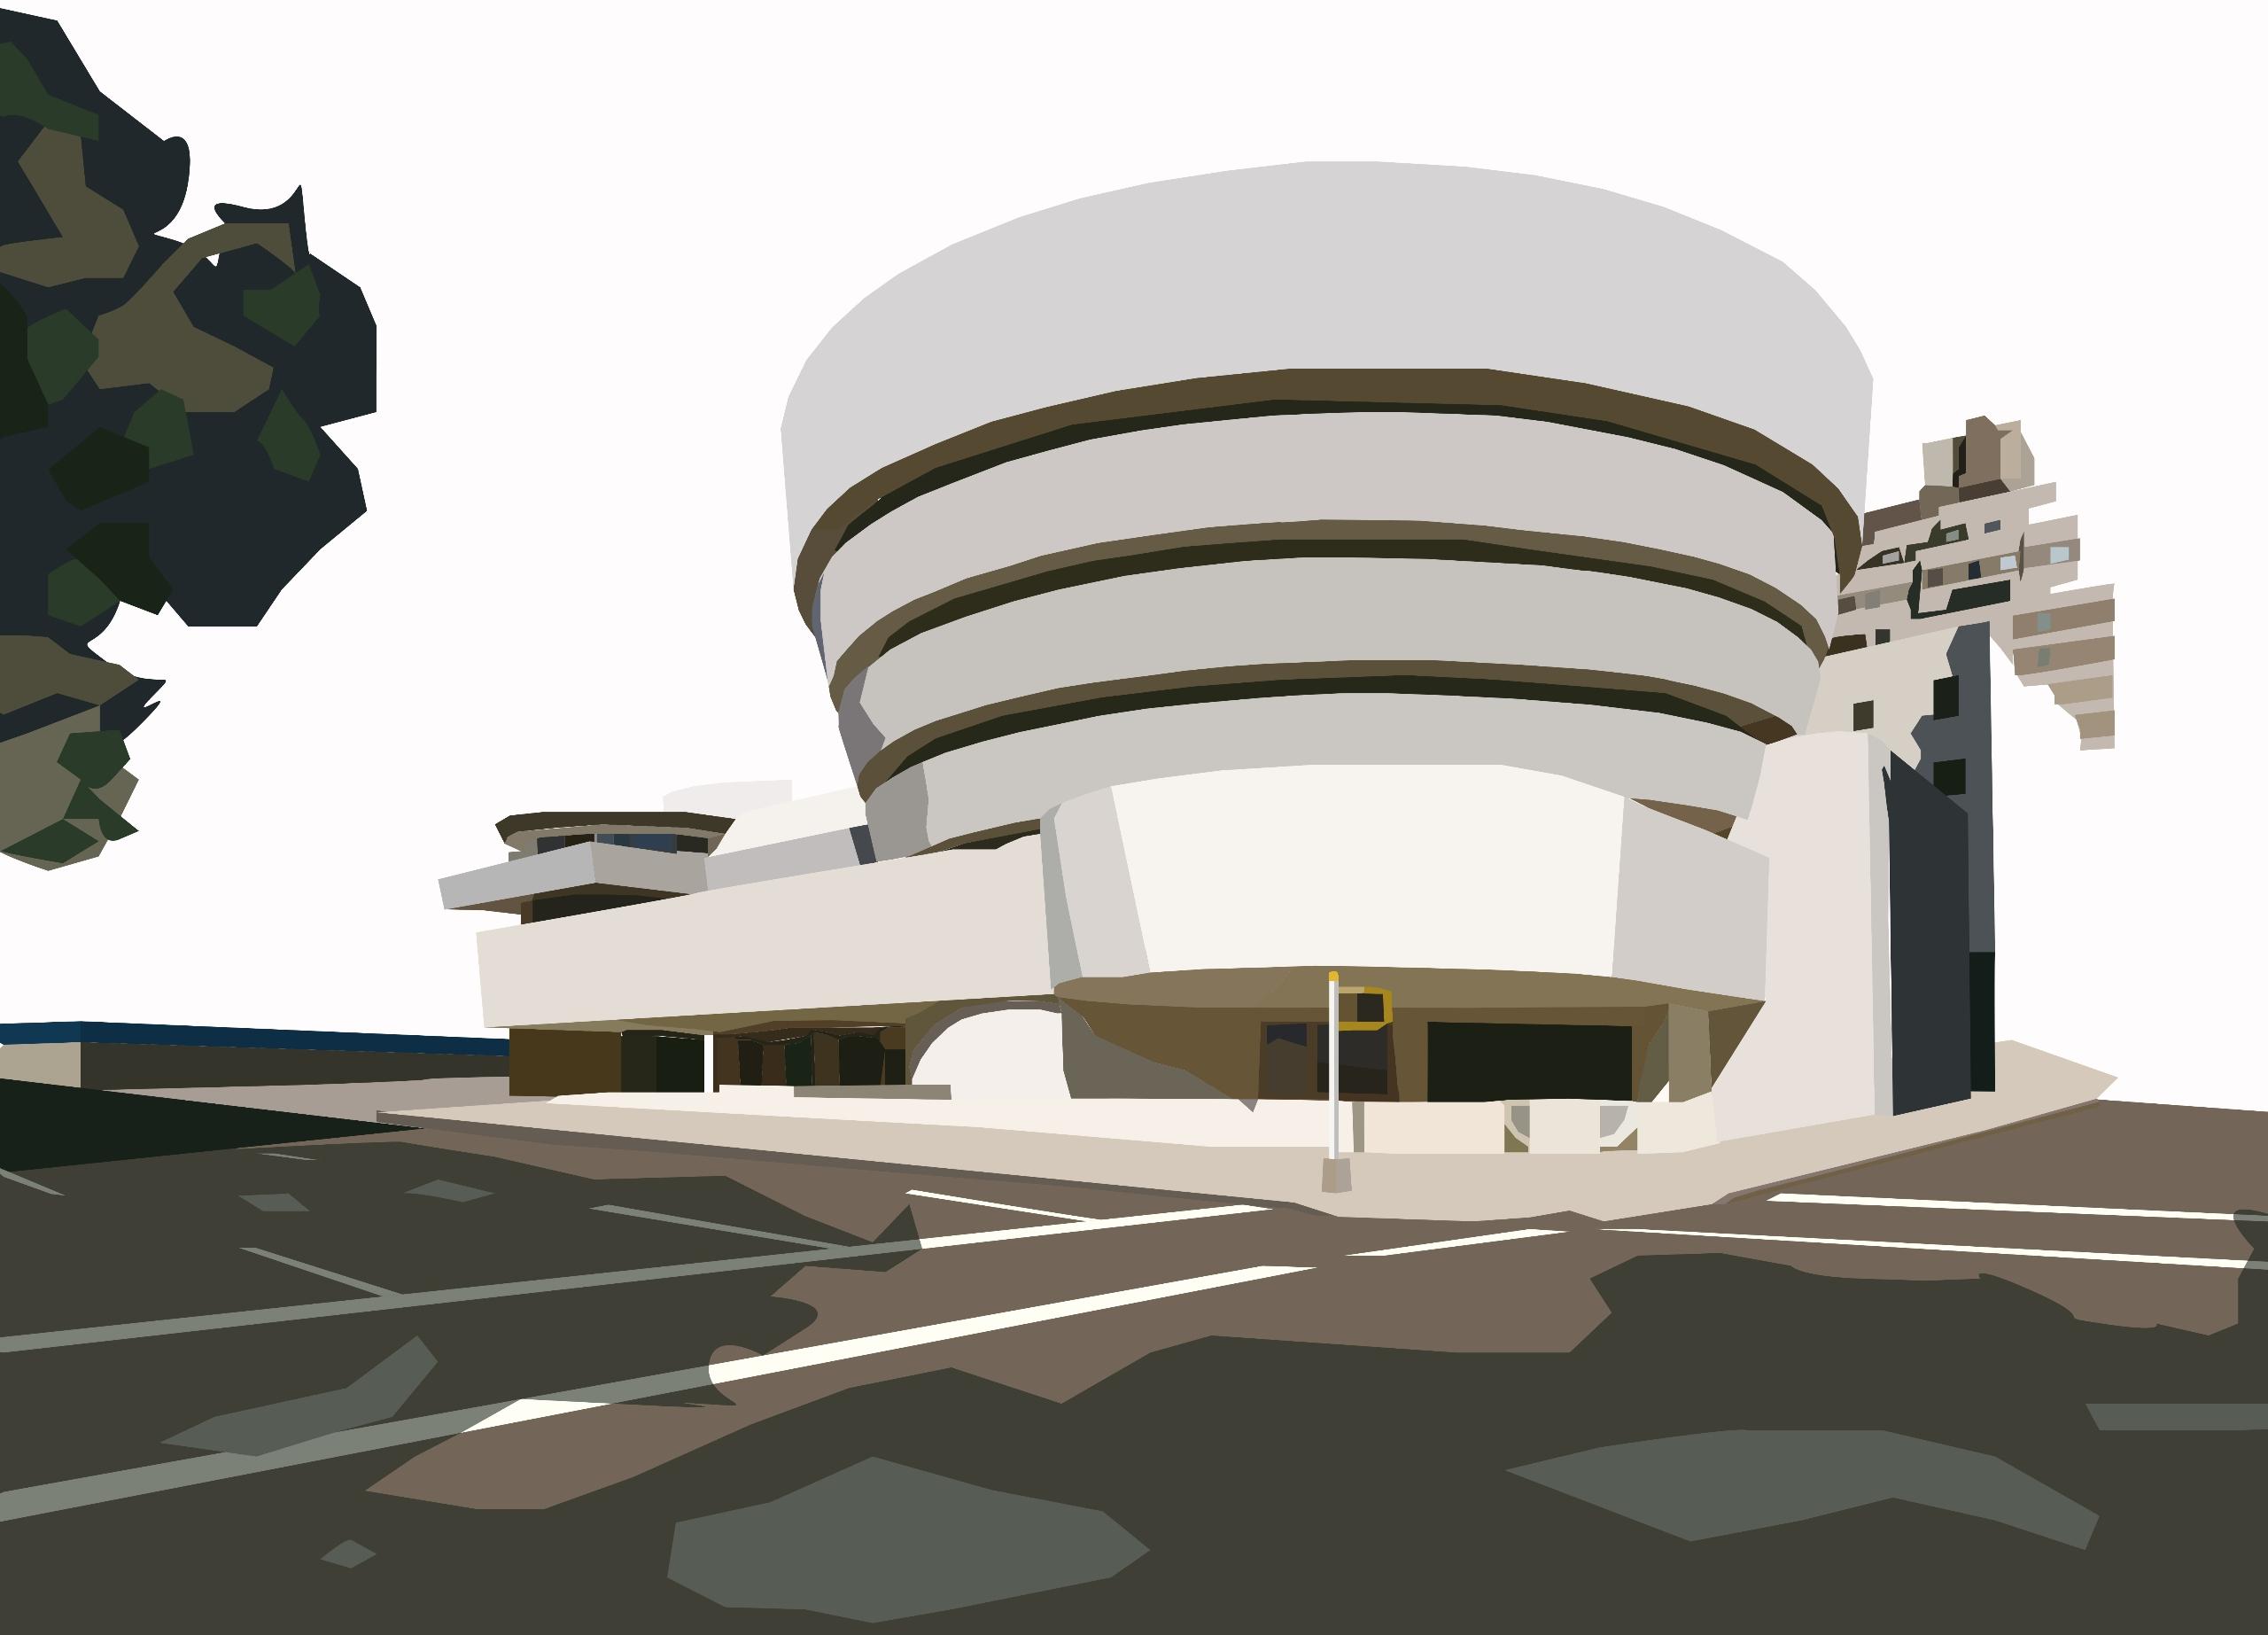 Solomon Guggenheim Museum - illustration - sophieillustration   ello